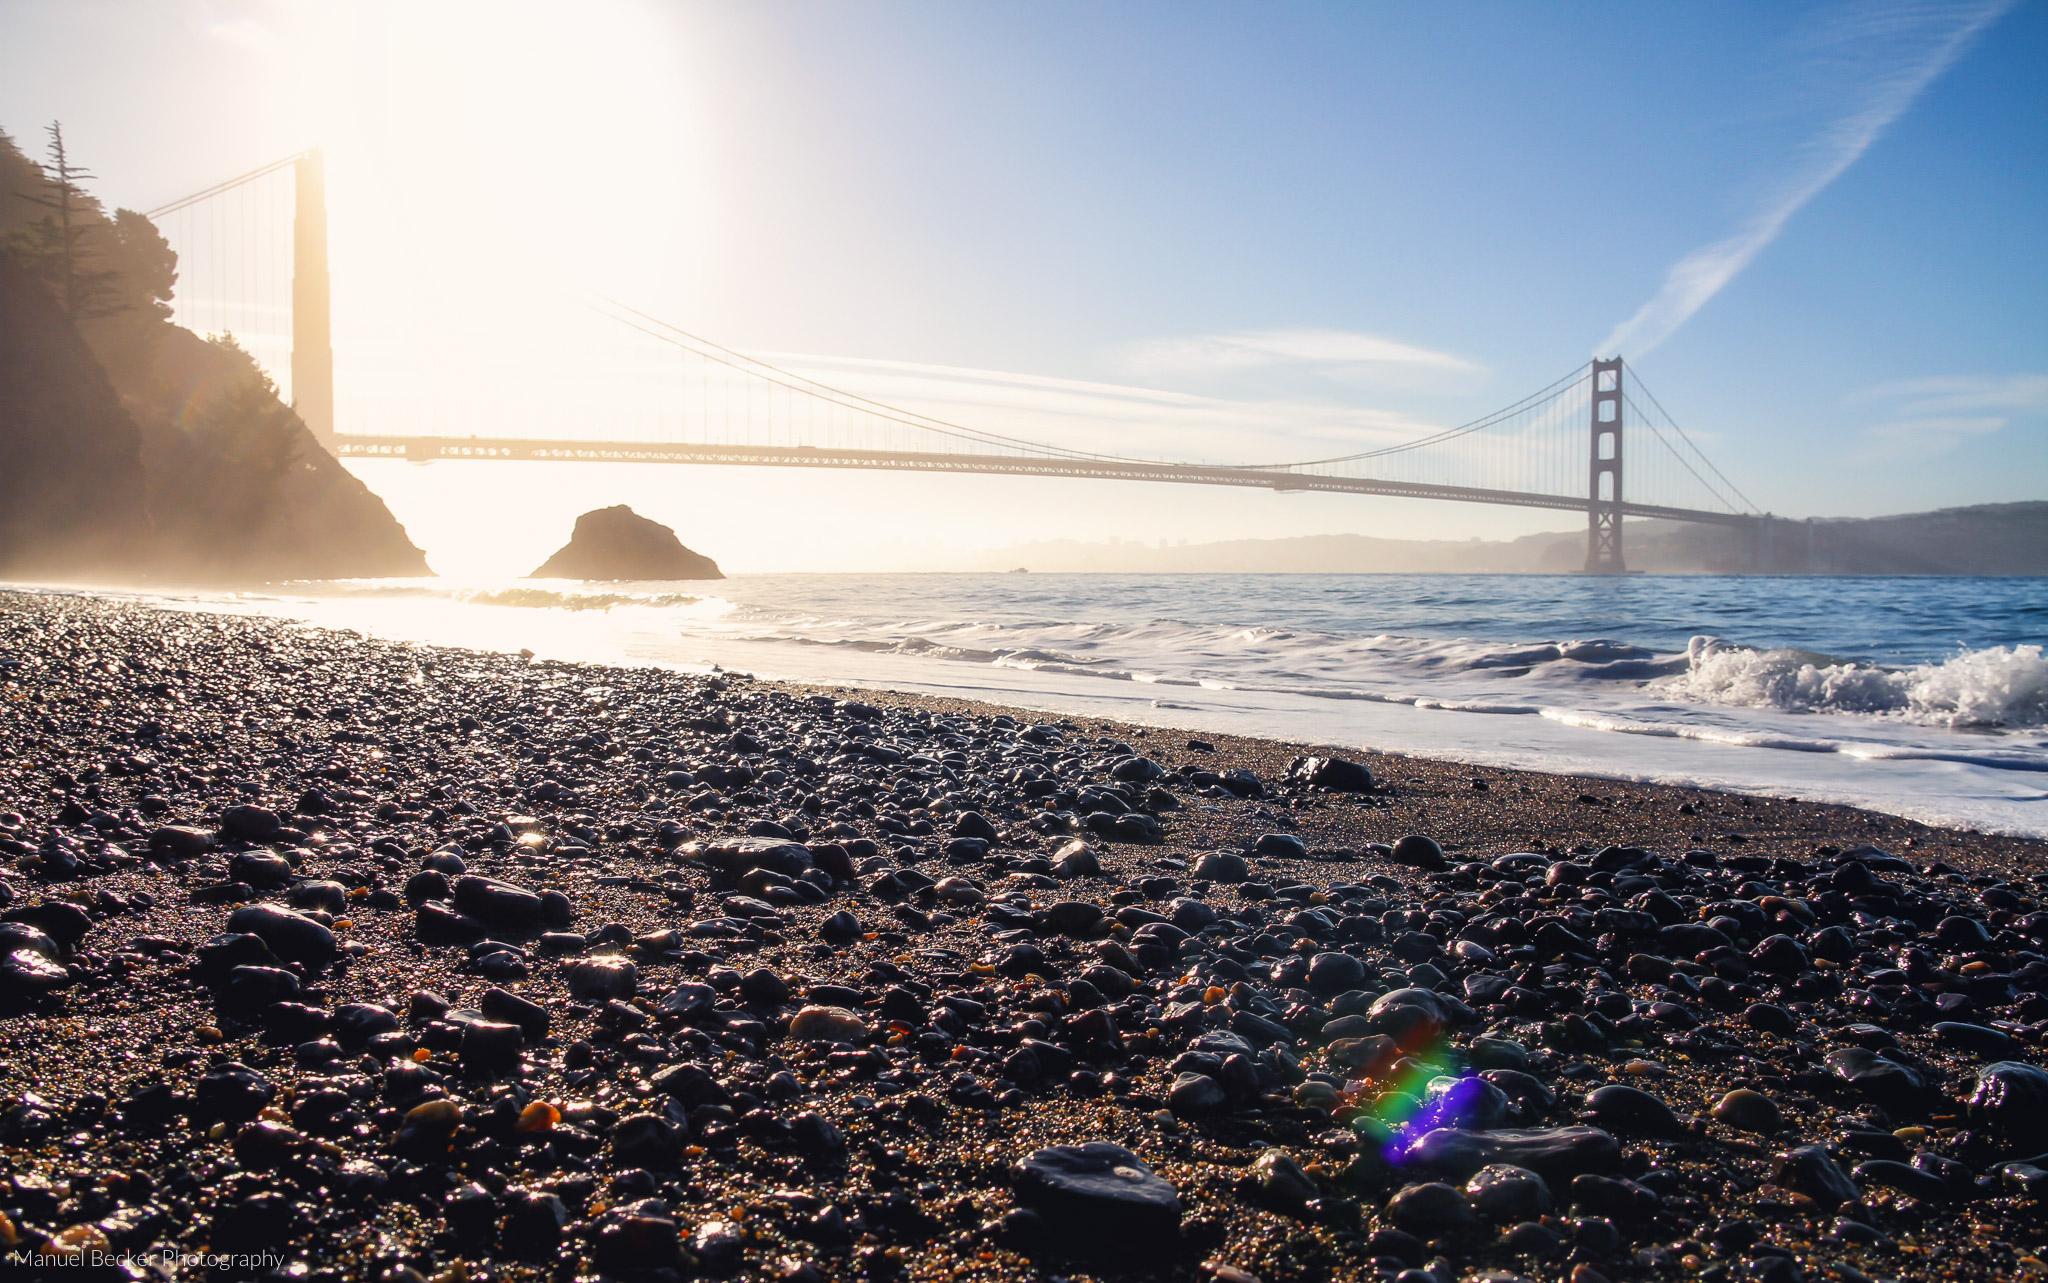 Kirby Cove, San Francisco, USA